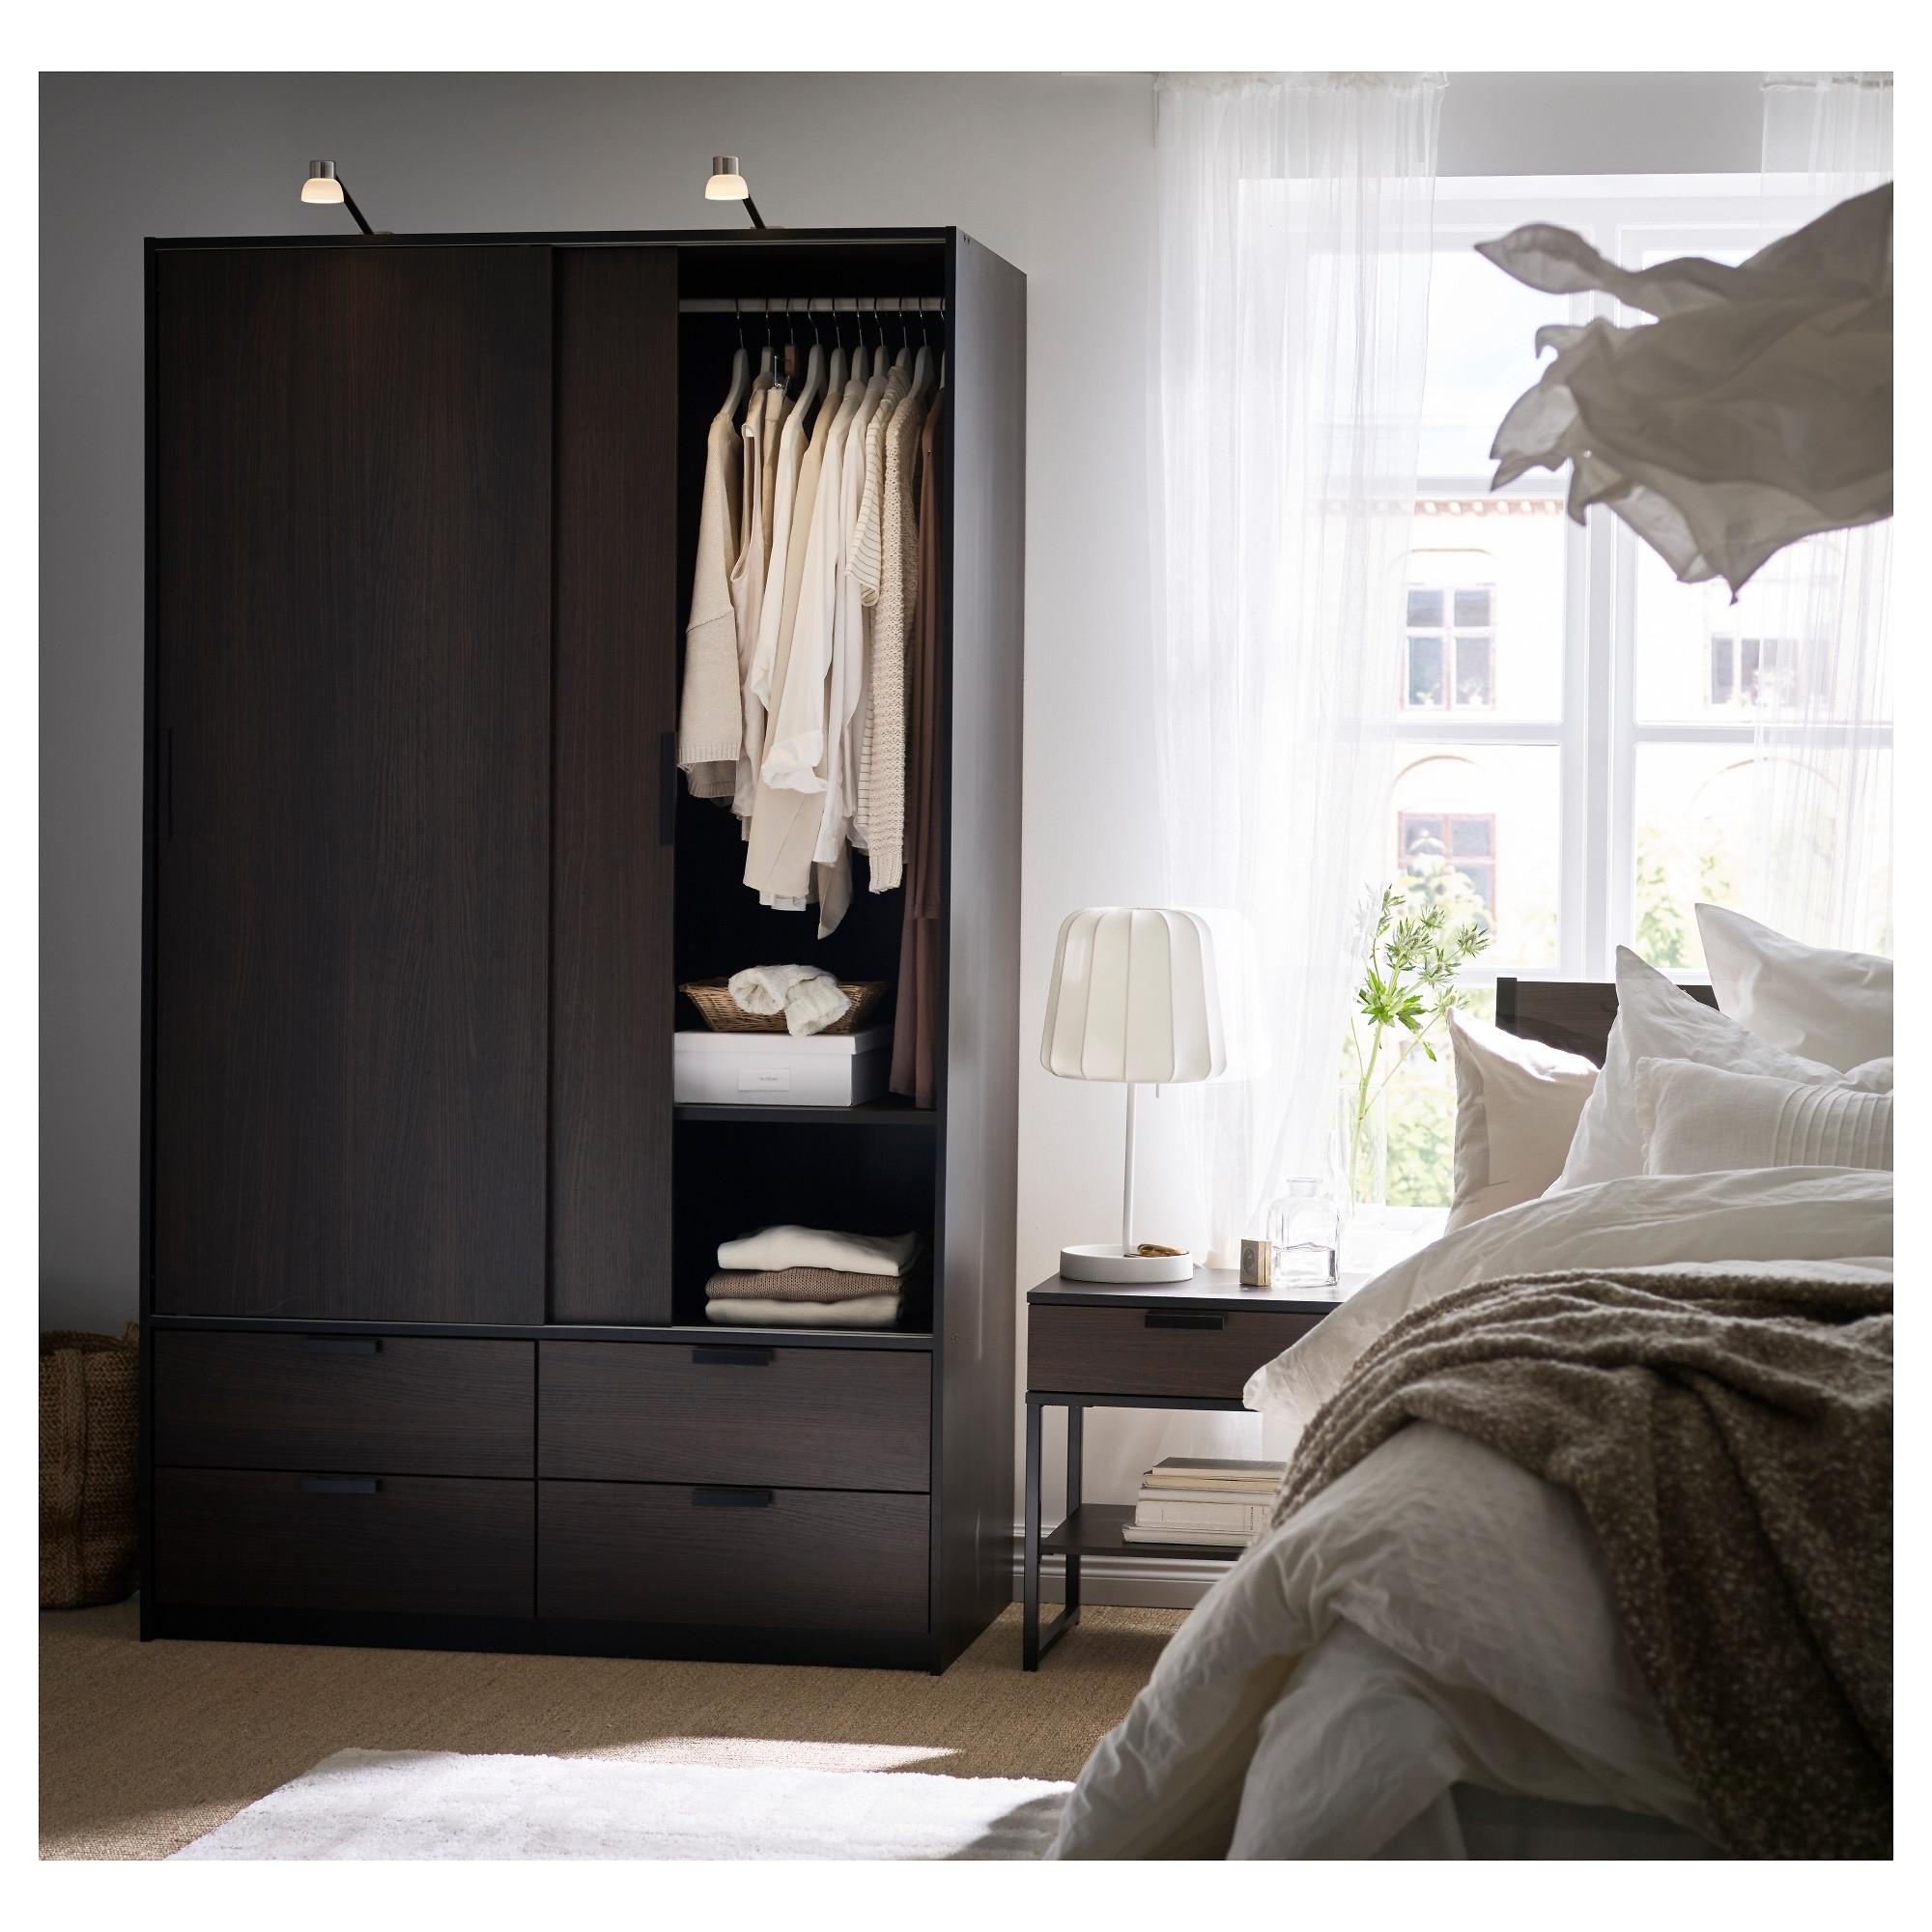 Dark Brown Wardrobes With Regard To Newest Trysil Wardrobe W Sliding Doors/4 Drawers – Dark Brown – Ikea (View 5 of 15)